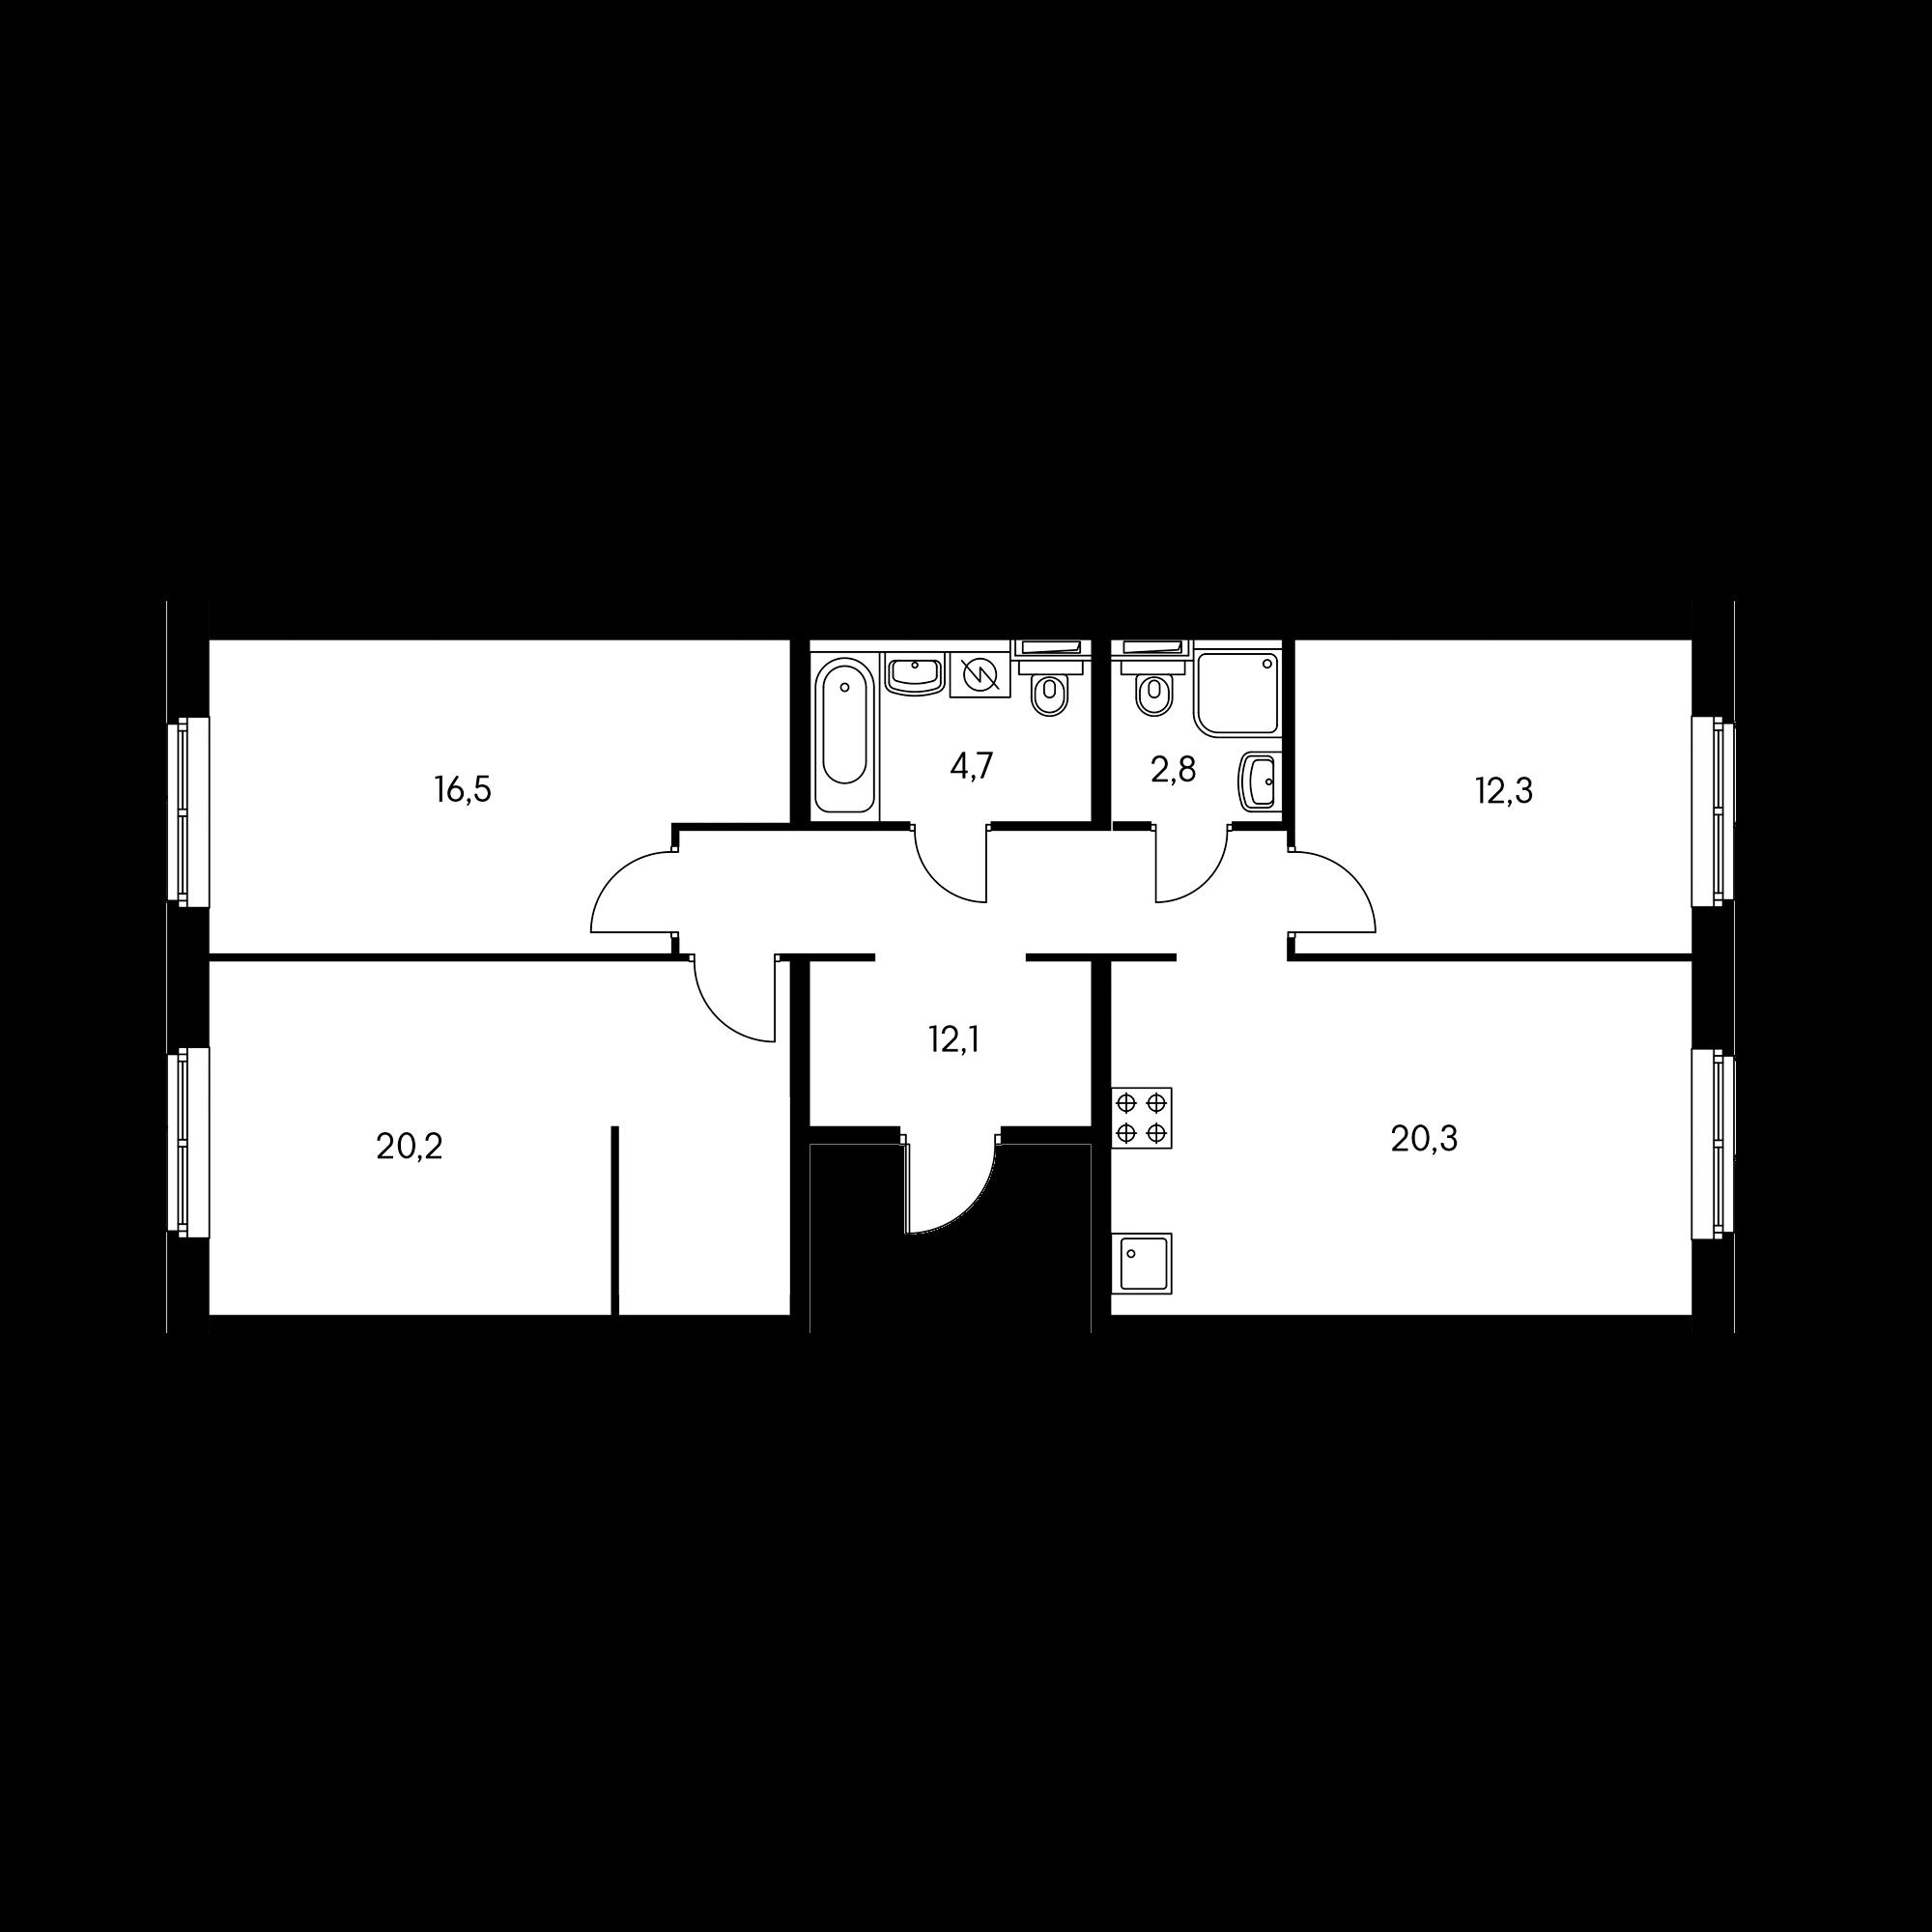 3EL5_6.9-2